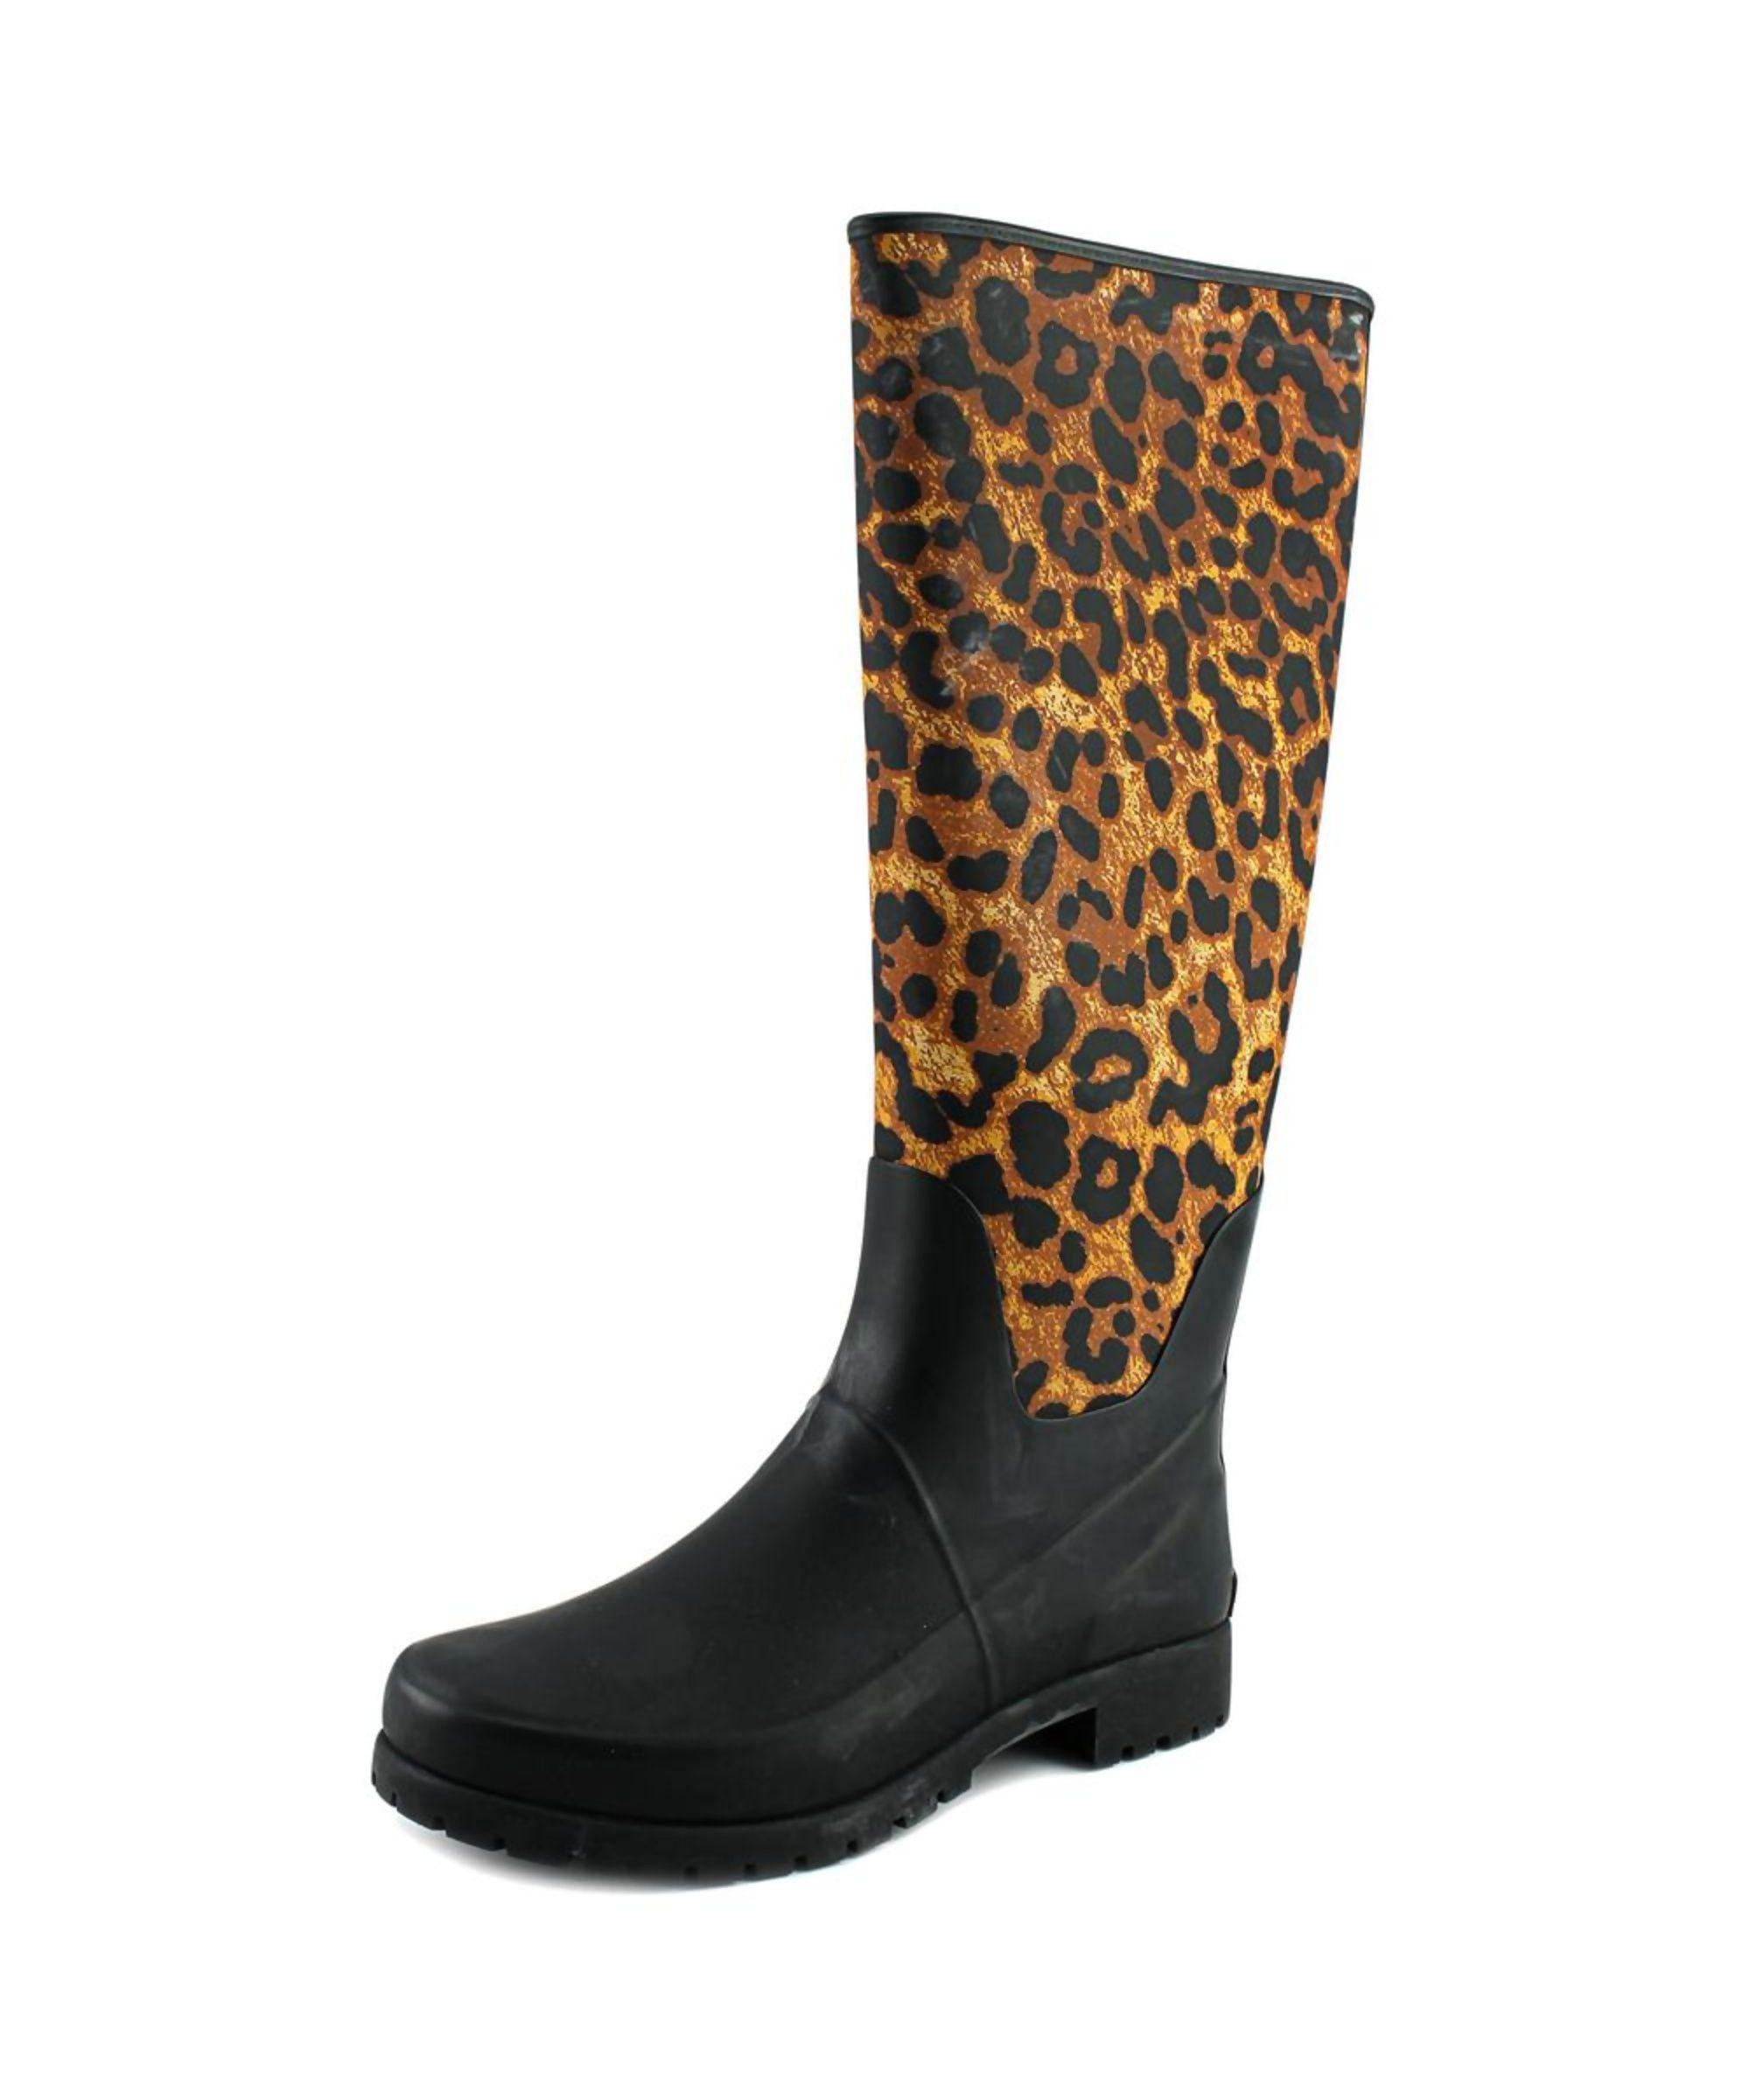 outlet fashion Style footlocker sale online Lauren Ralph Lauren Round-Toe Knee-High Rain Boots discount release dates find great cheap online VP9I3rpy0